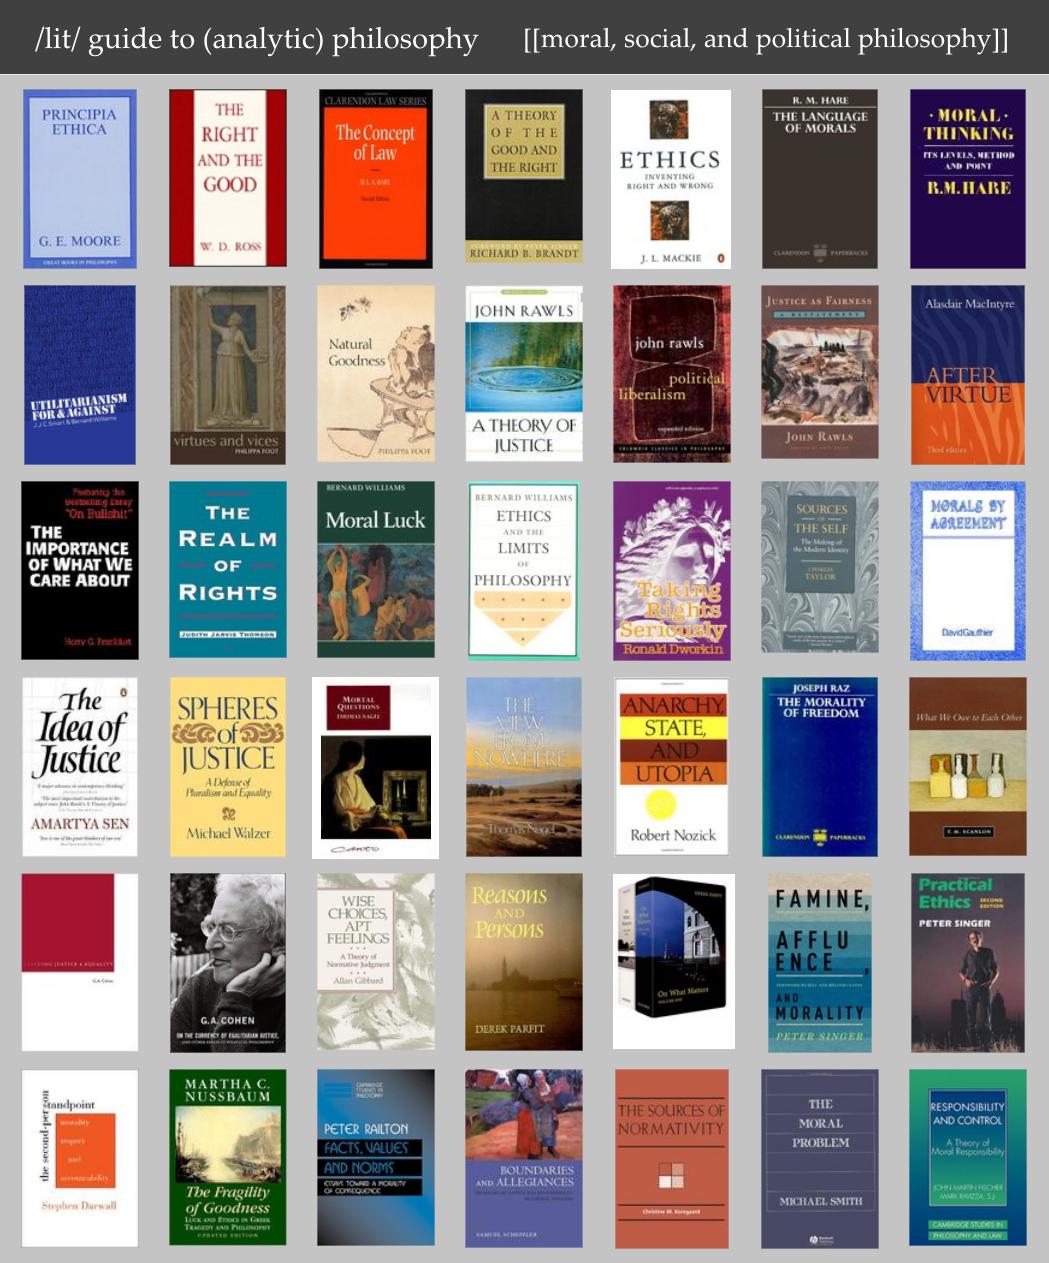 lit/ - Literature